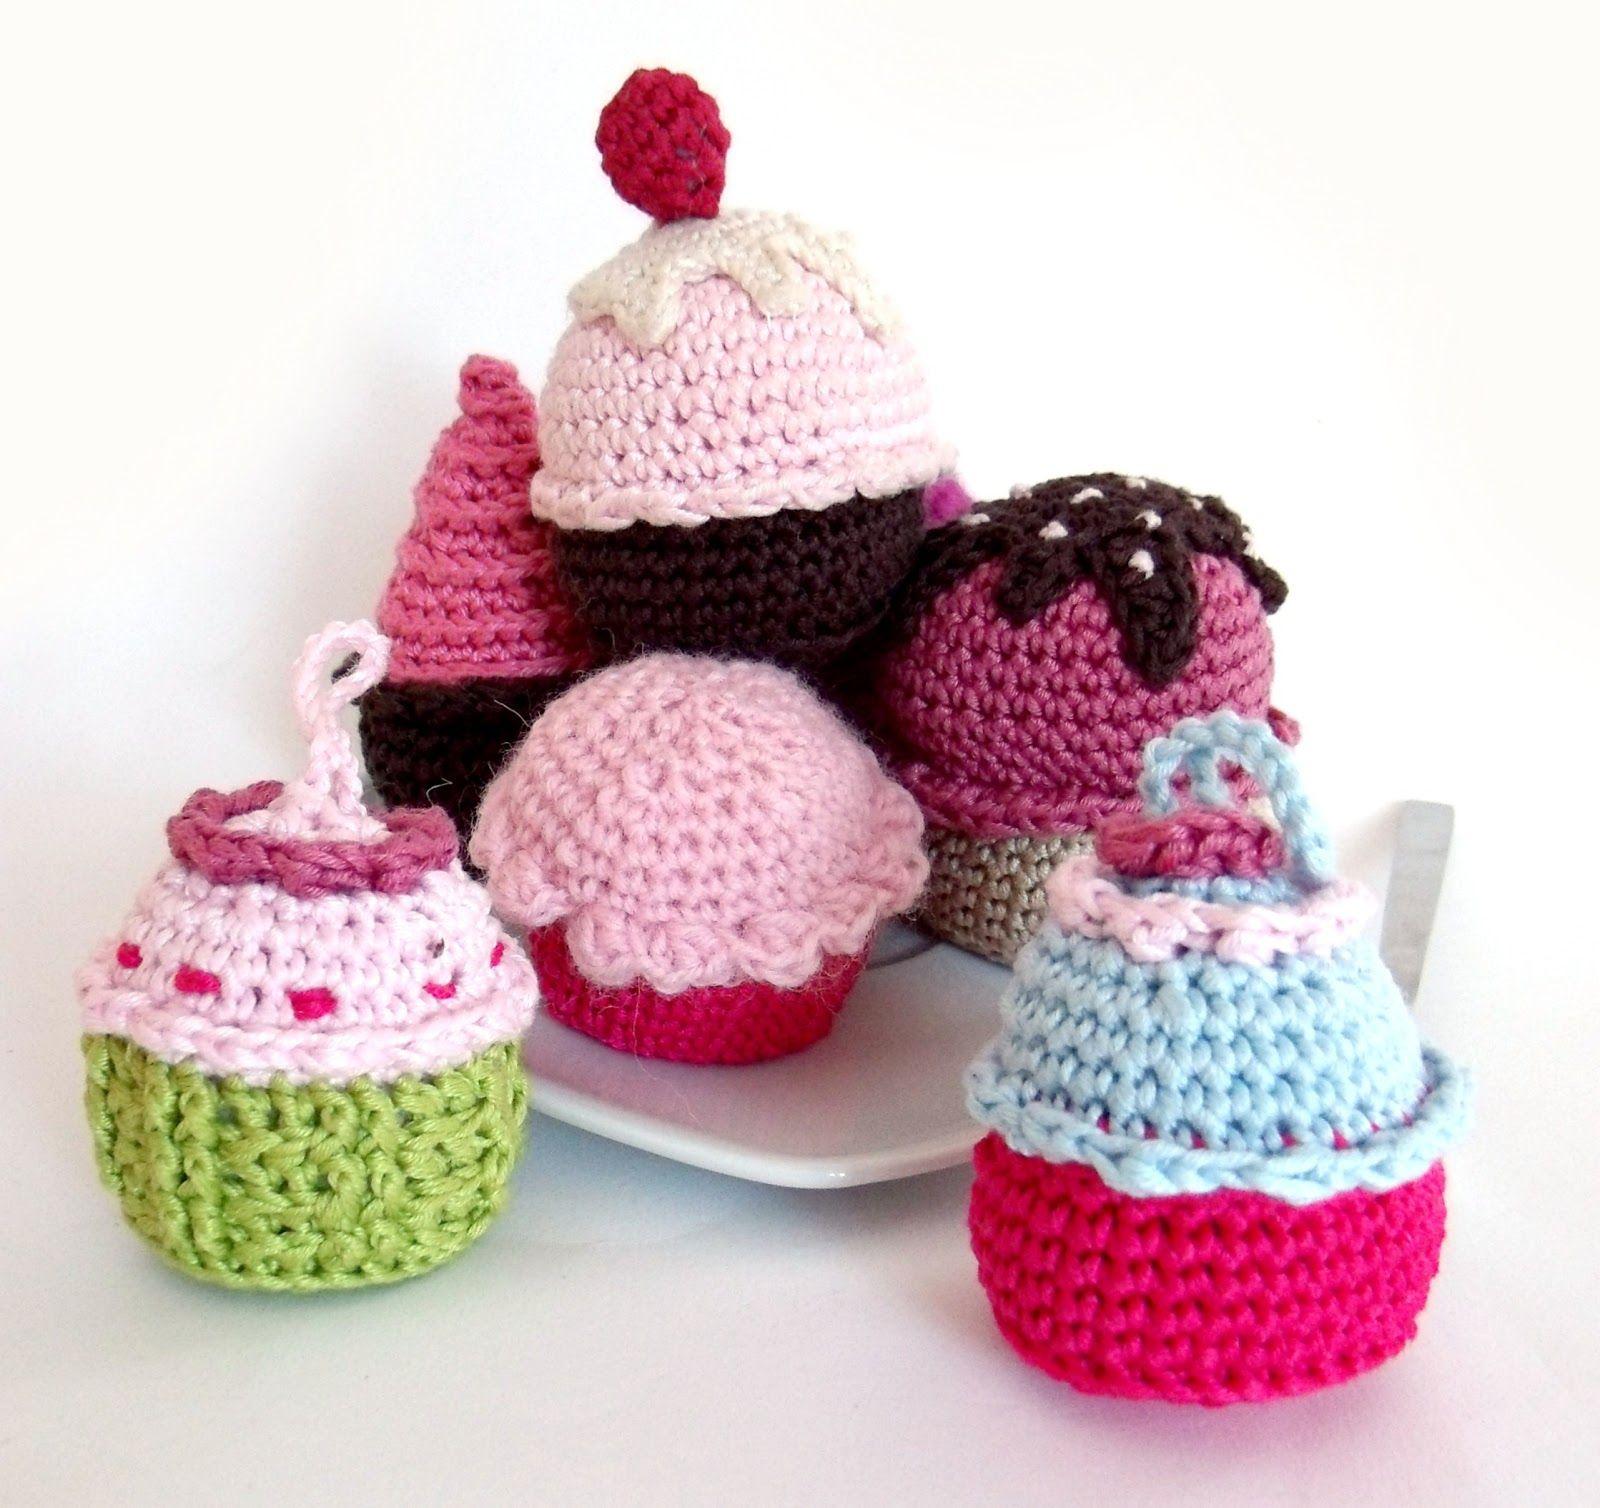 Cupcake Crochet Pattern Best Decorating Ideas